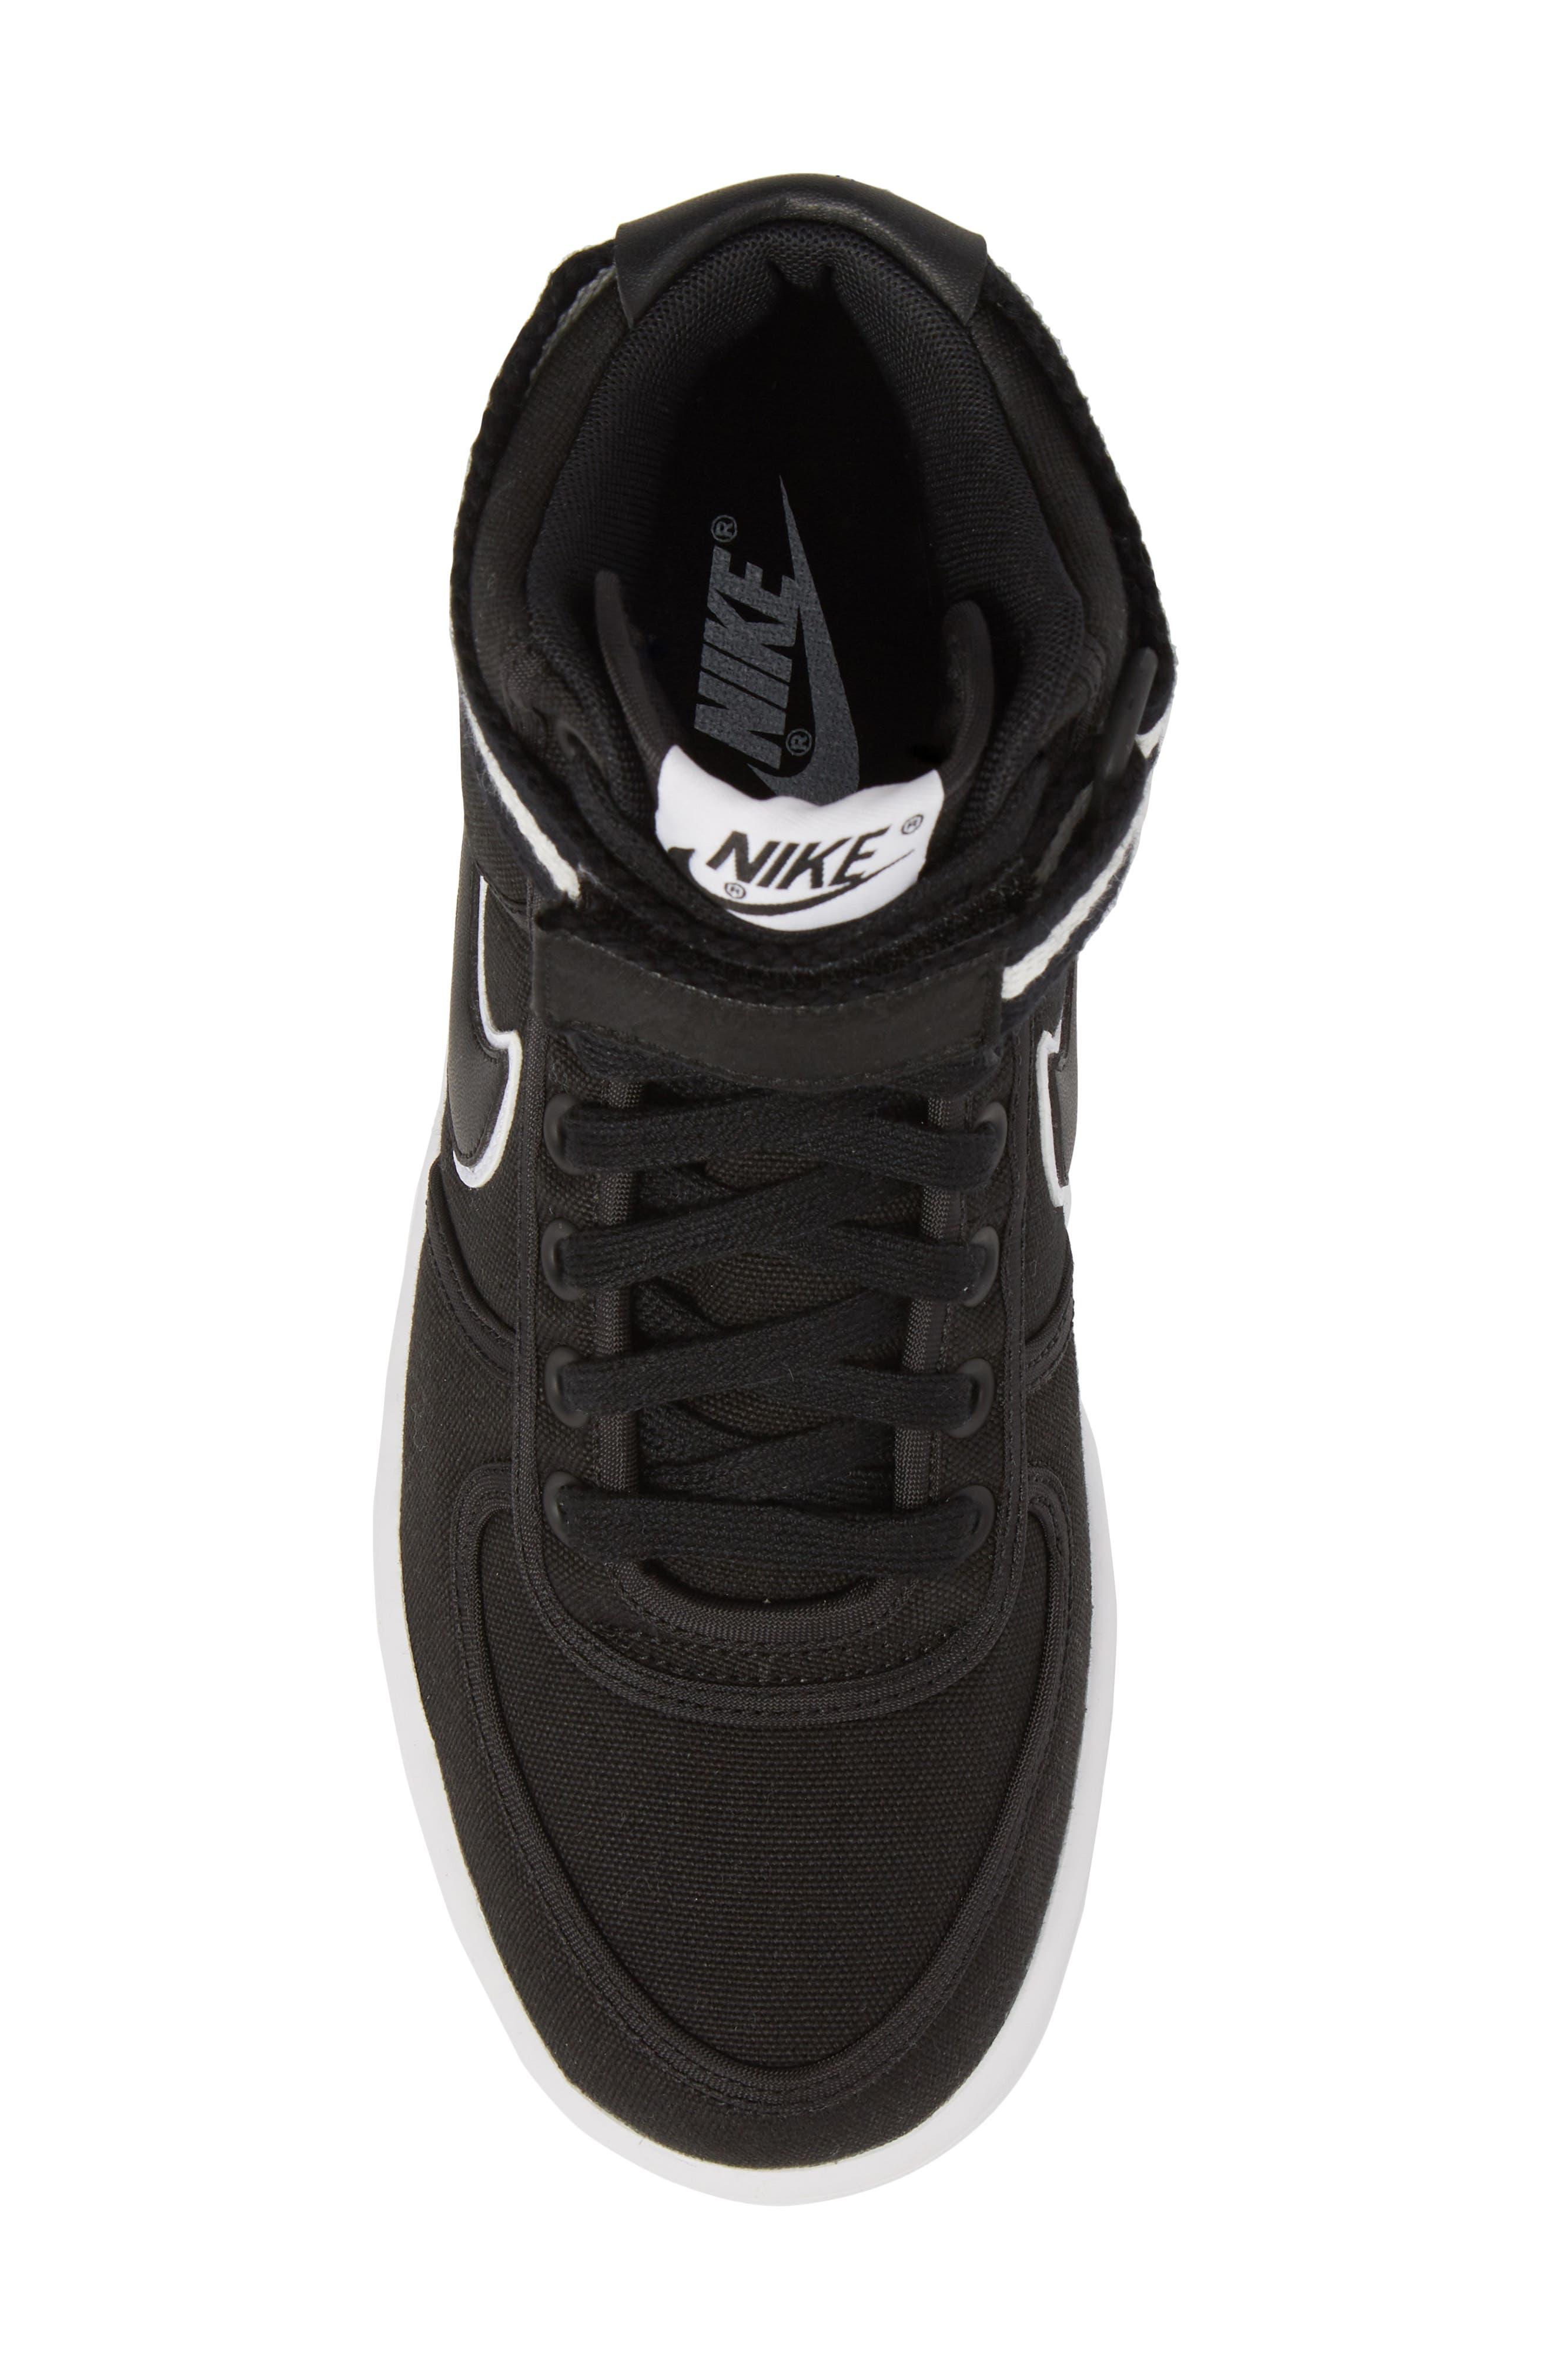 Vandal High Top Sneaker,                             Alternate thumbnail 5, color,                             Black/ Black-White